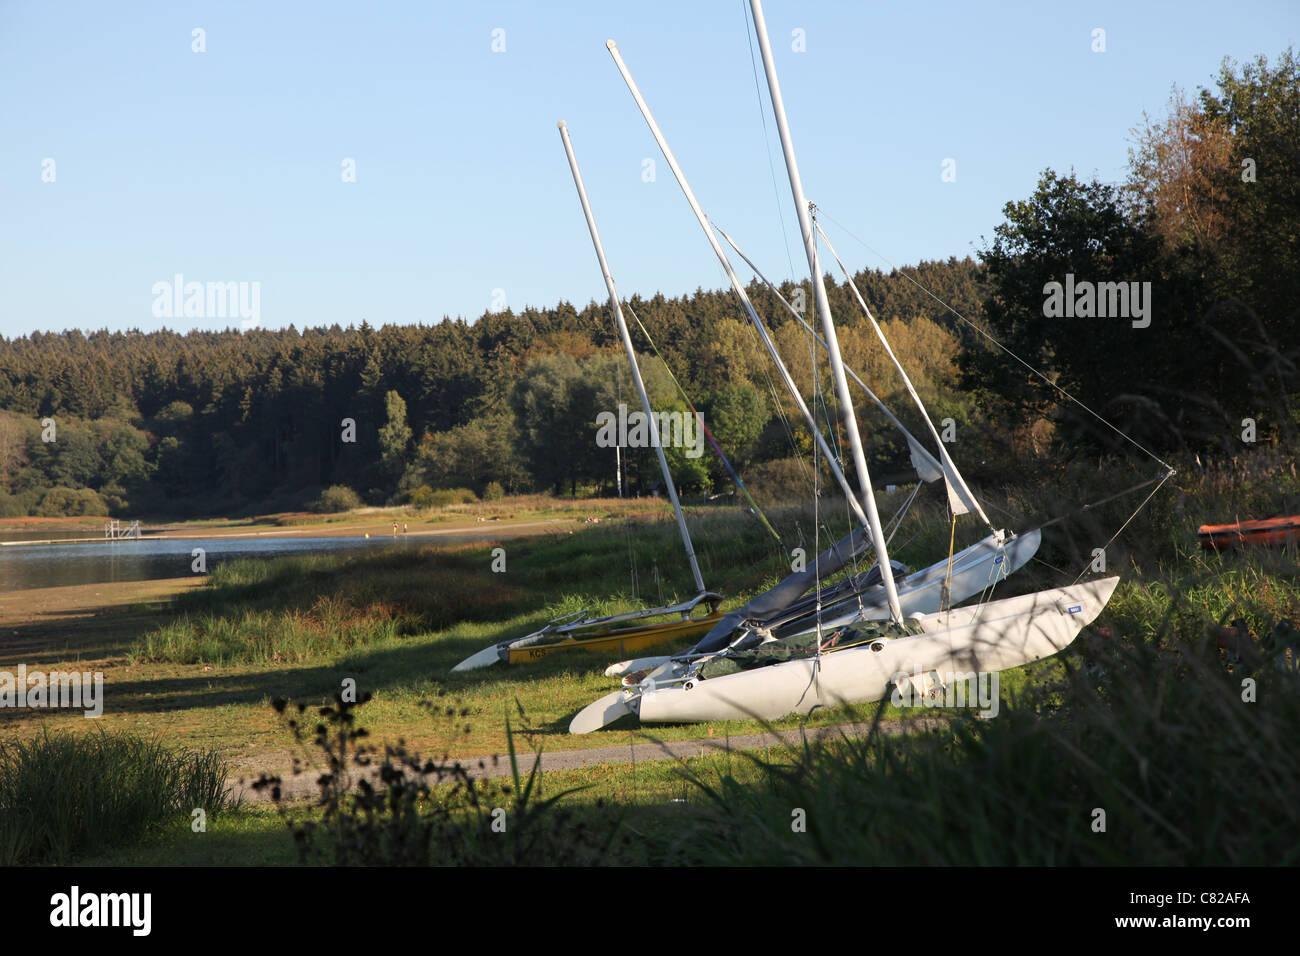 Brucher See mit Segelboot, Lake with sailingboat - Stock Image